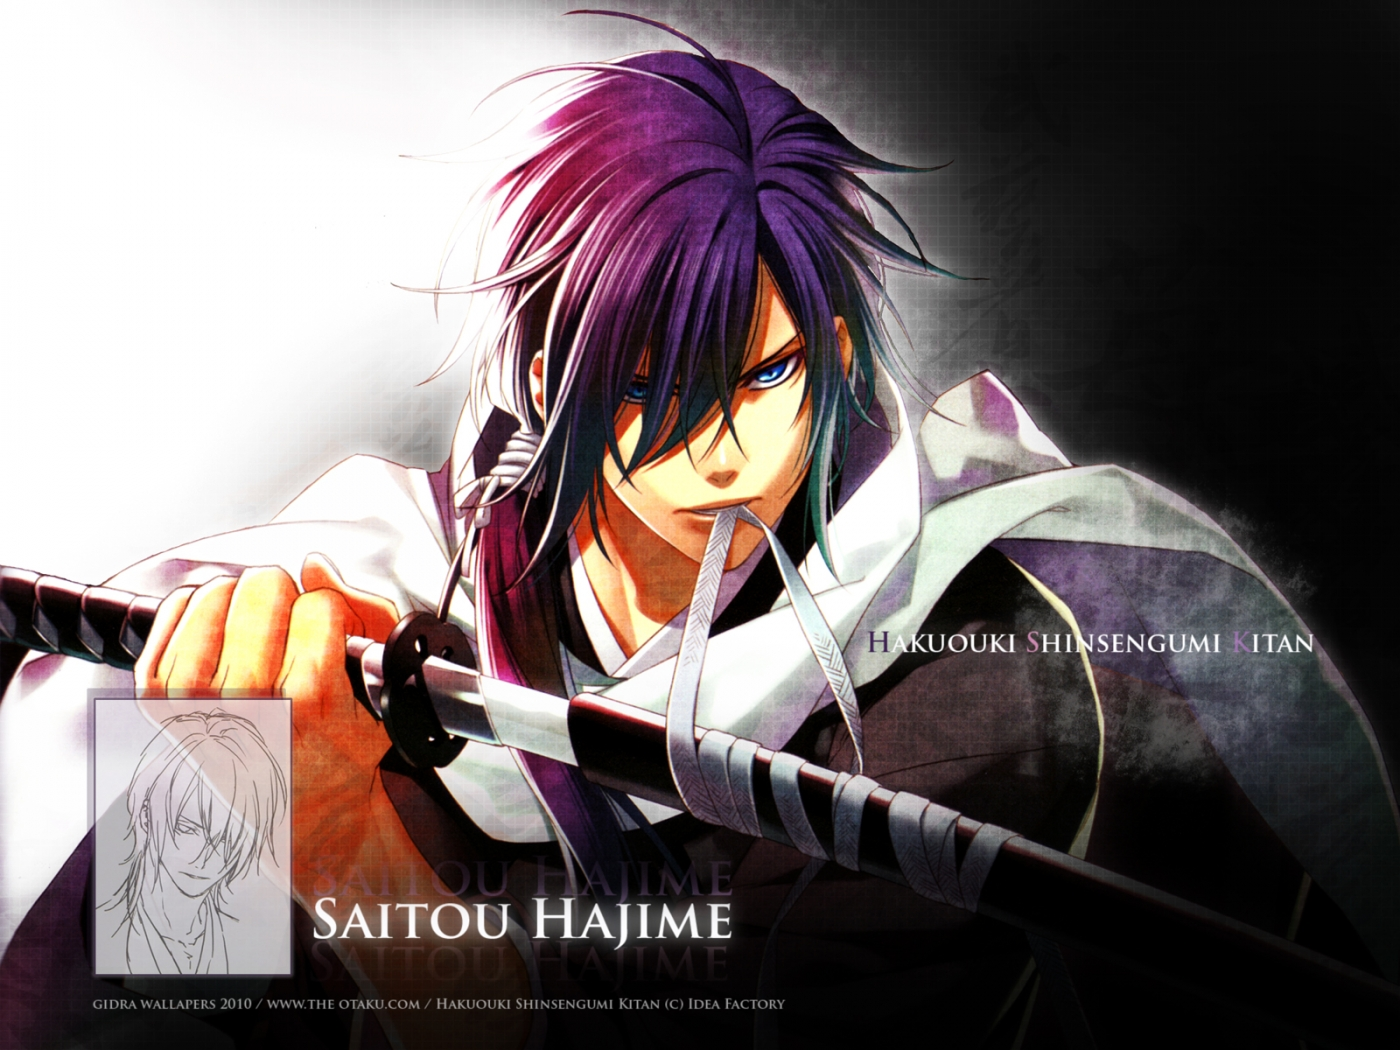 http://1.bp.blogspot.com/_doX0ANuAq8E/TMxarBRTR3I/AAAAAAAAAPY/LoJQCyiUaH0/s1600/Saito_Hajime_72337_1400x1050%5BtheAnimeGallery.com%5D.jpg